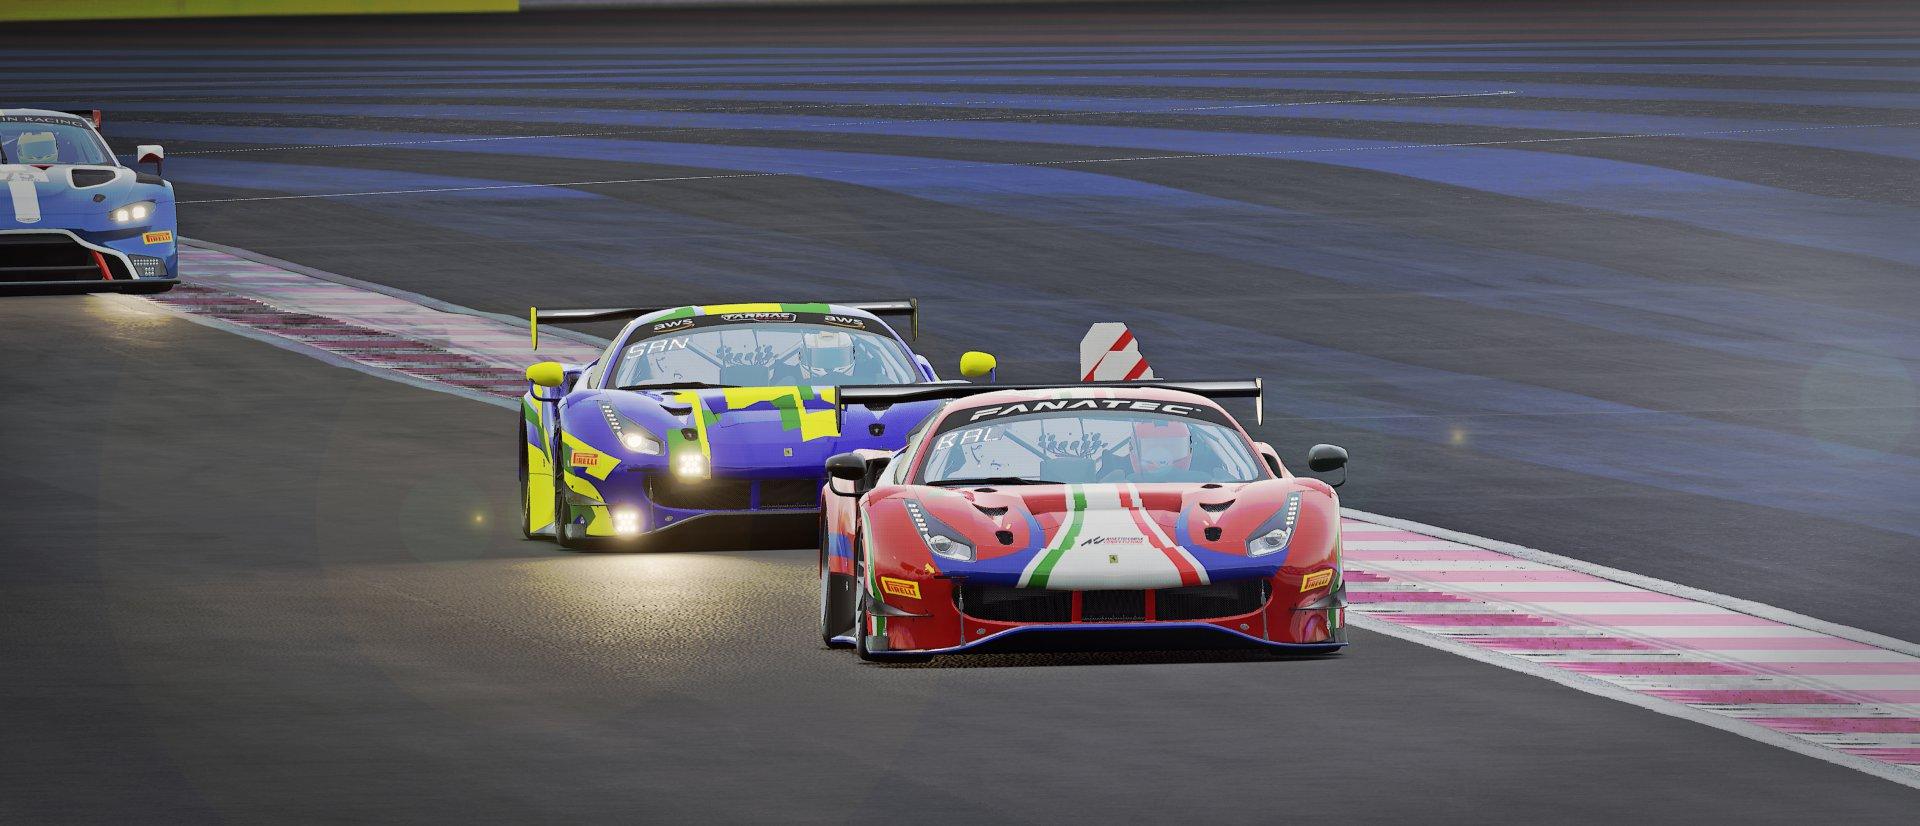 Assetto Corsa Competizione Screenshot 2021.05.17 - 11.16.55.51.jpg